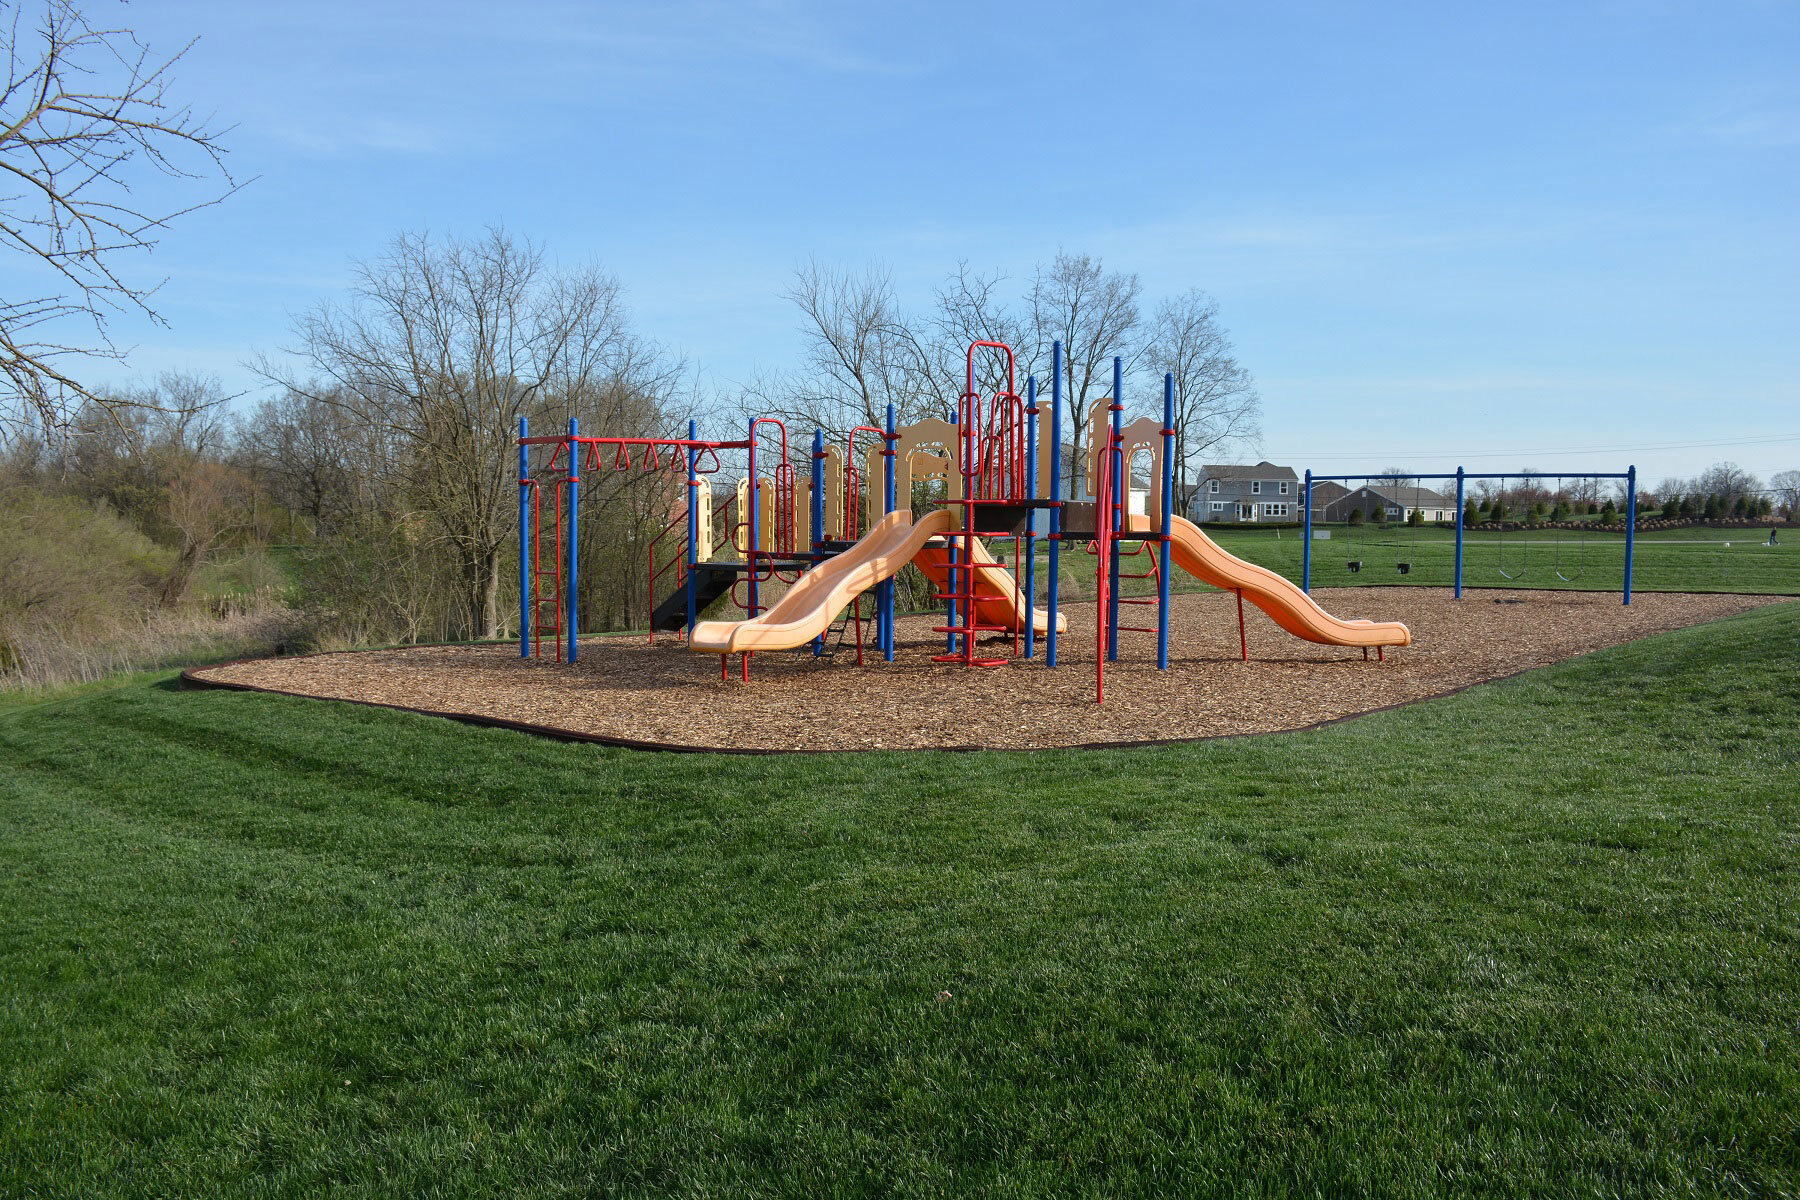 Trails of Shaker Run Estates Playground